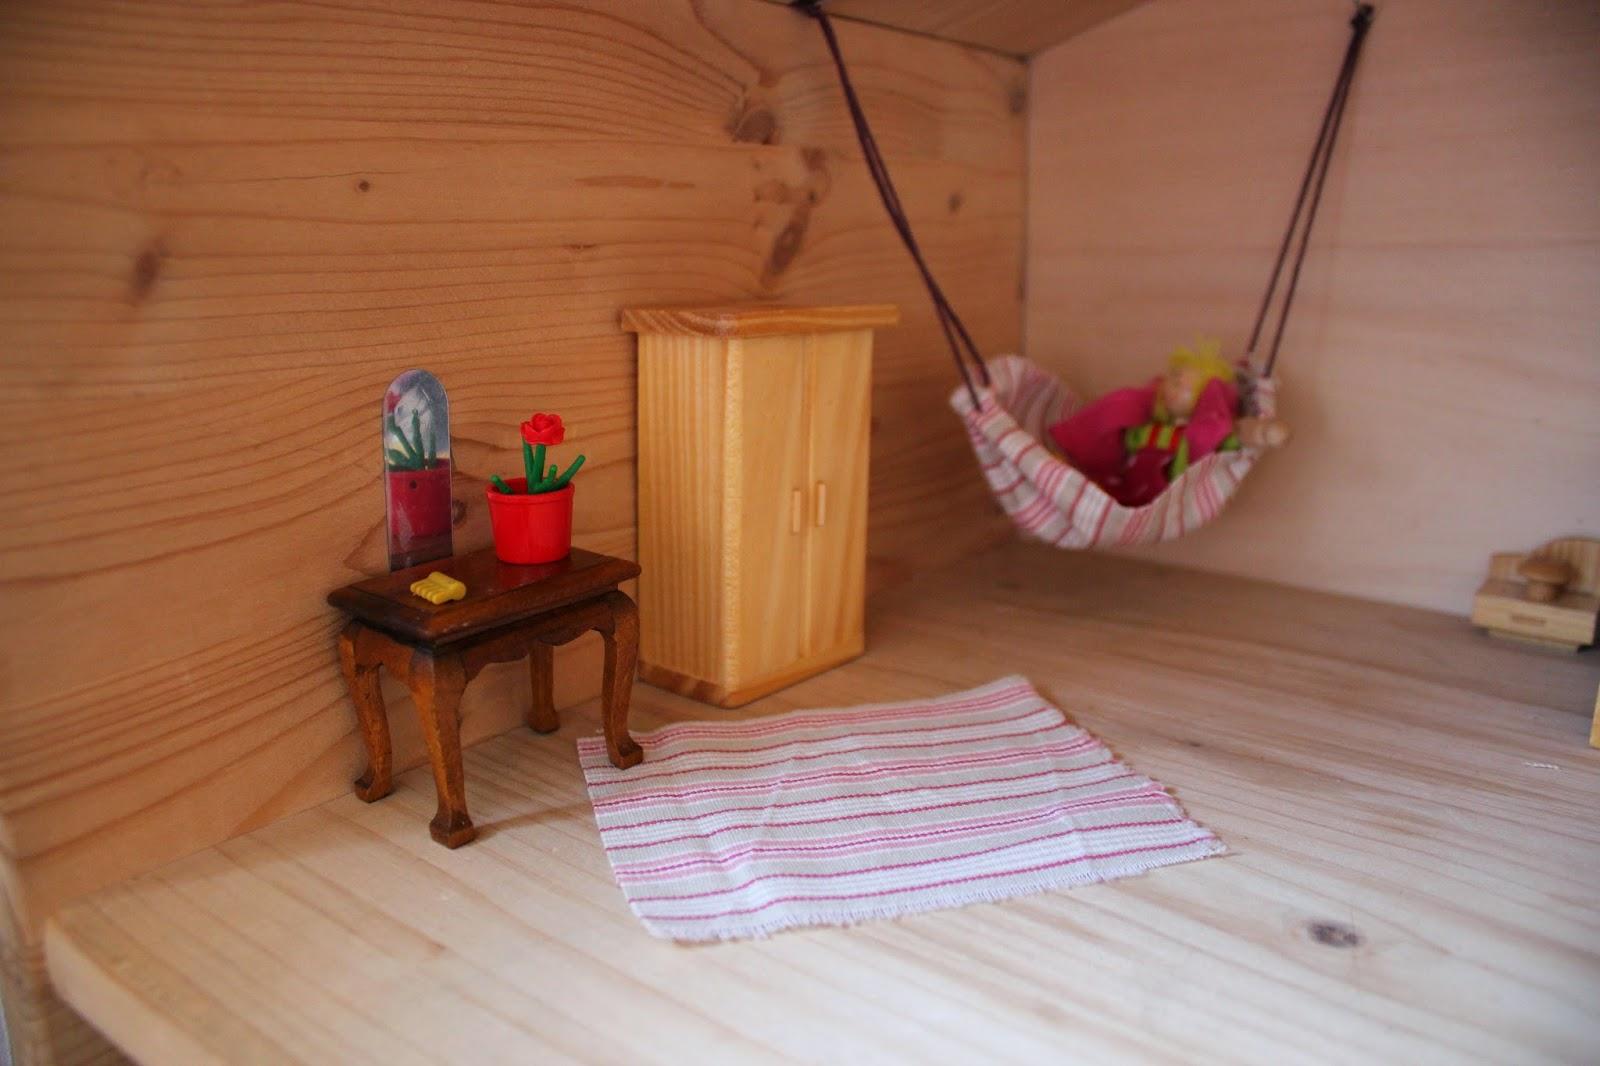 tatii talentlos puppenhauszubeh r selbst gemacht. Black Bedroom Furniture Sets. Home Design Ideas